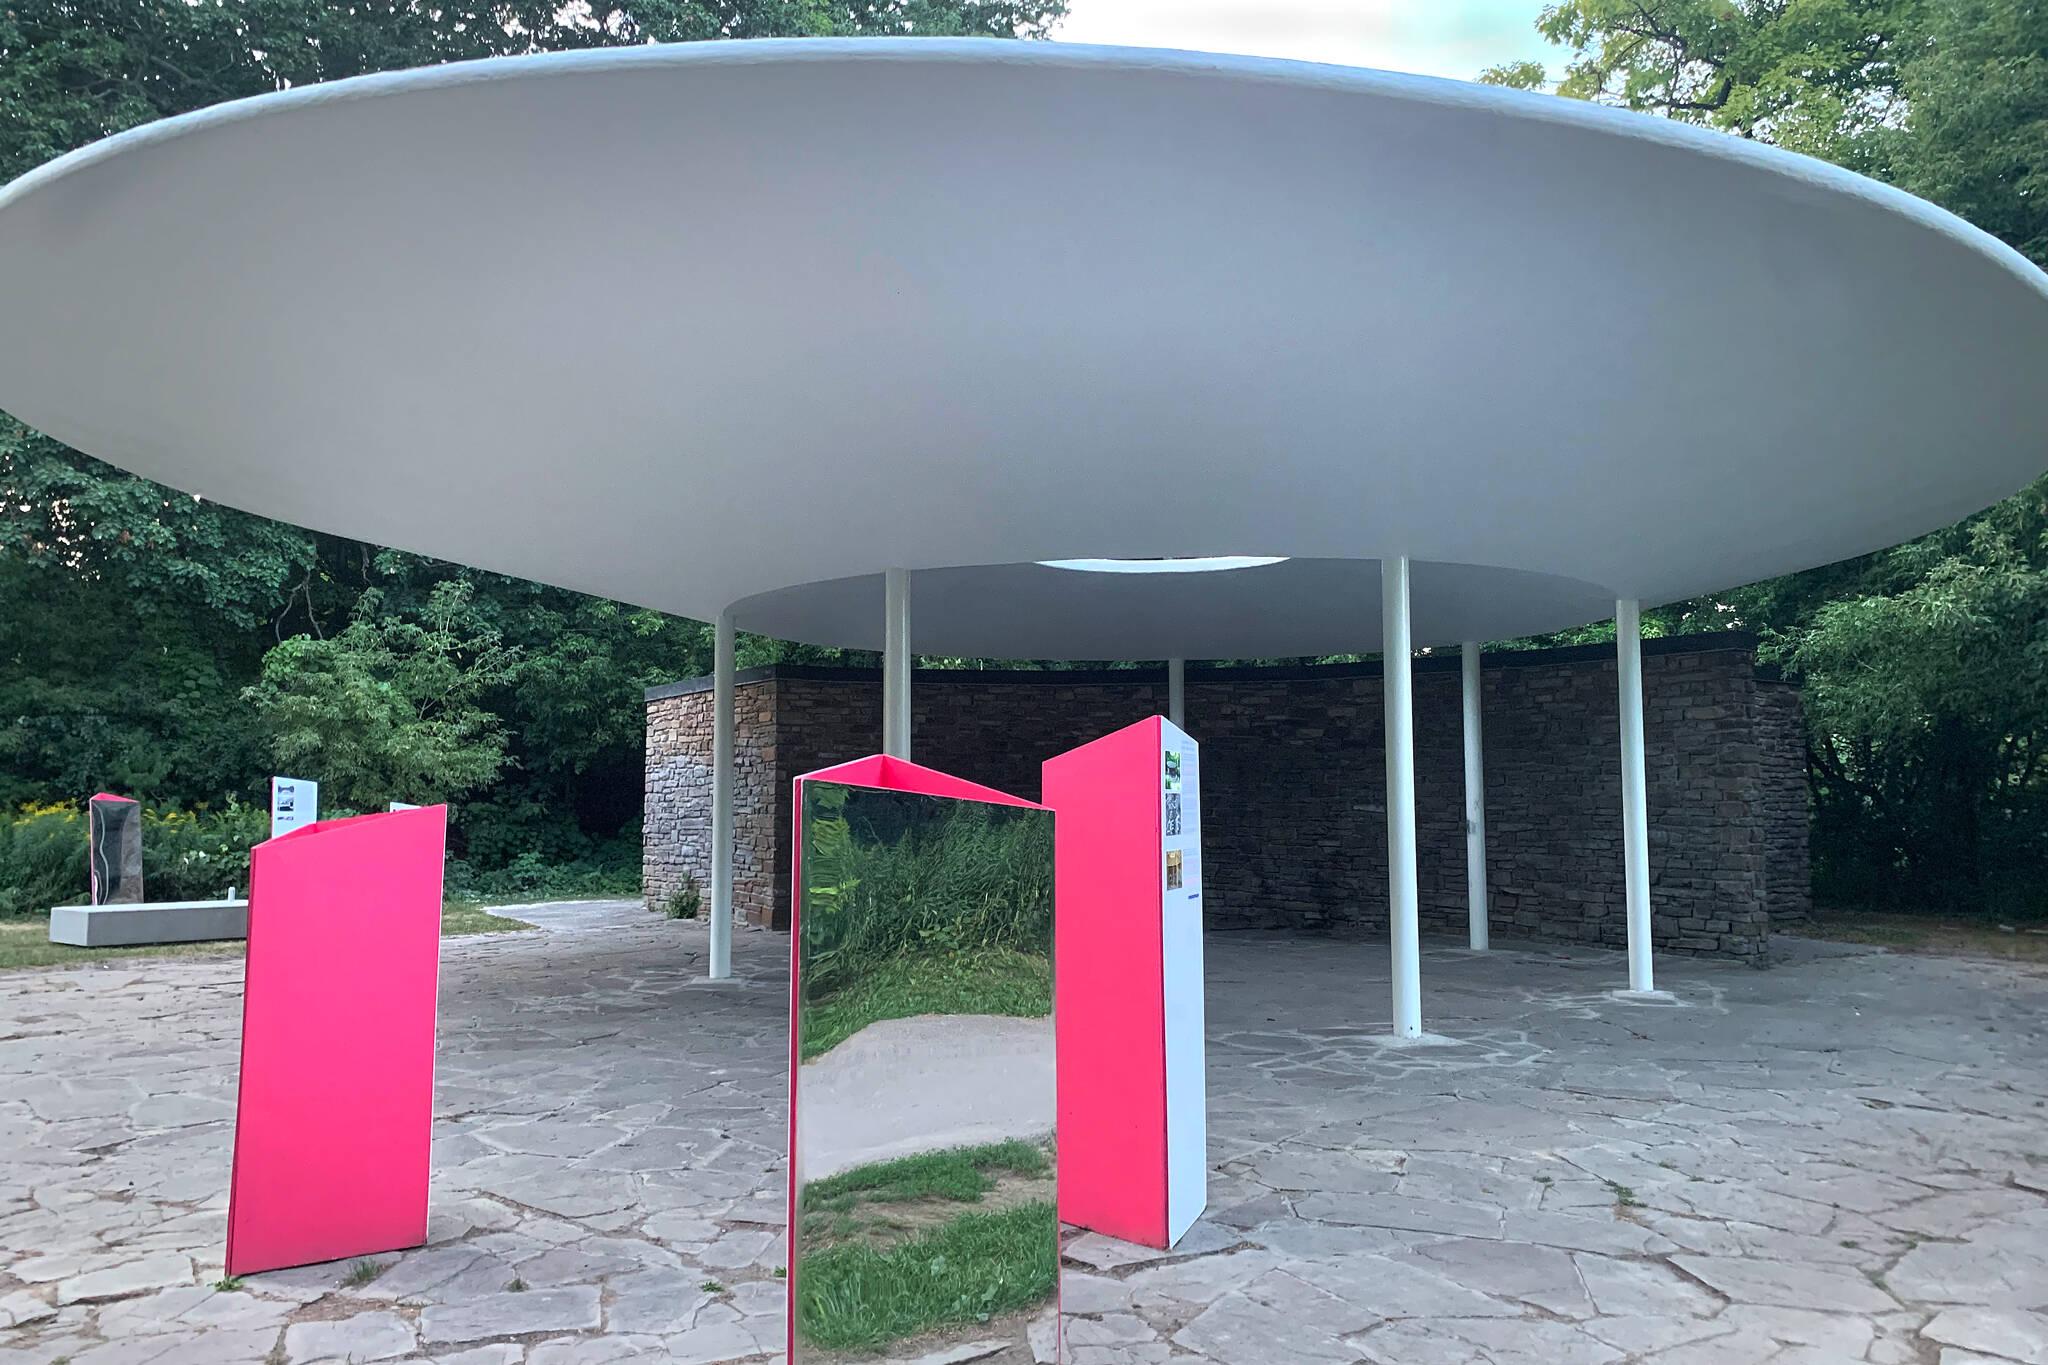 oculus pavilion